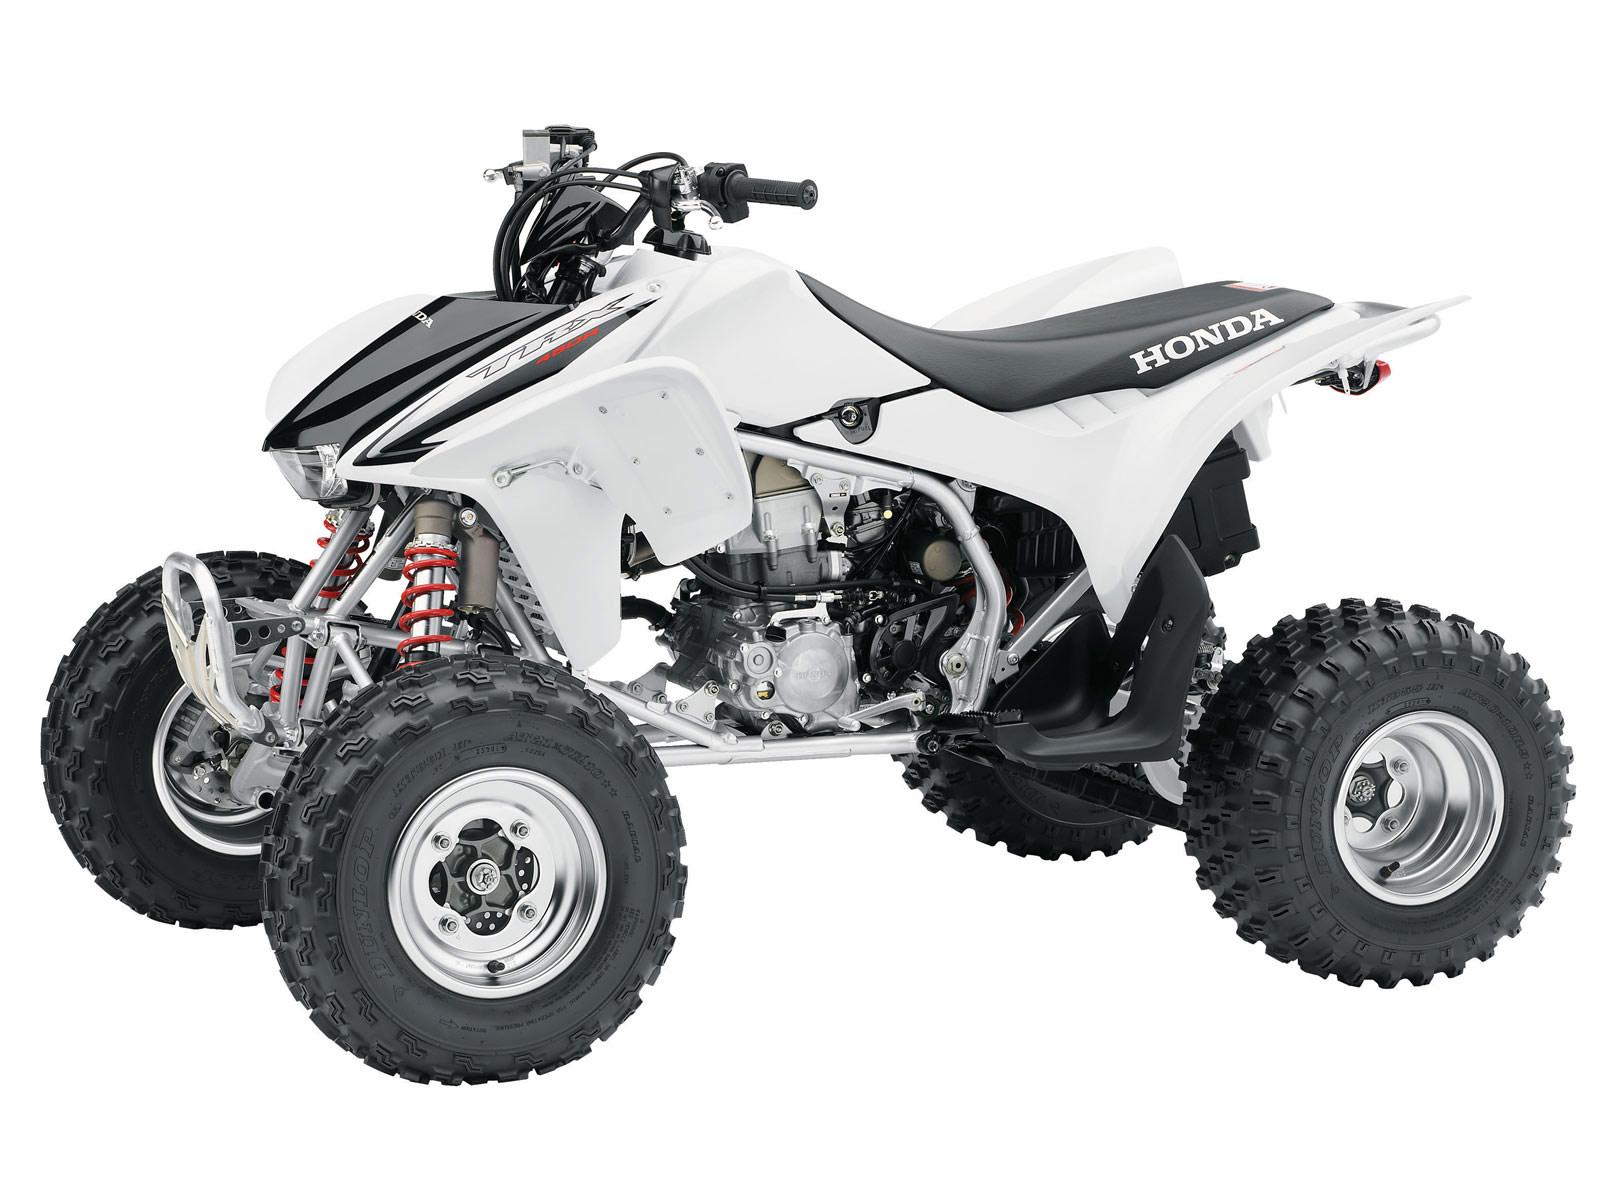 2008 HONDA TRX450ER ATV accident lawyers information